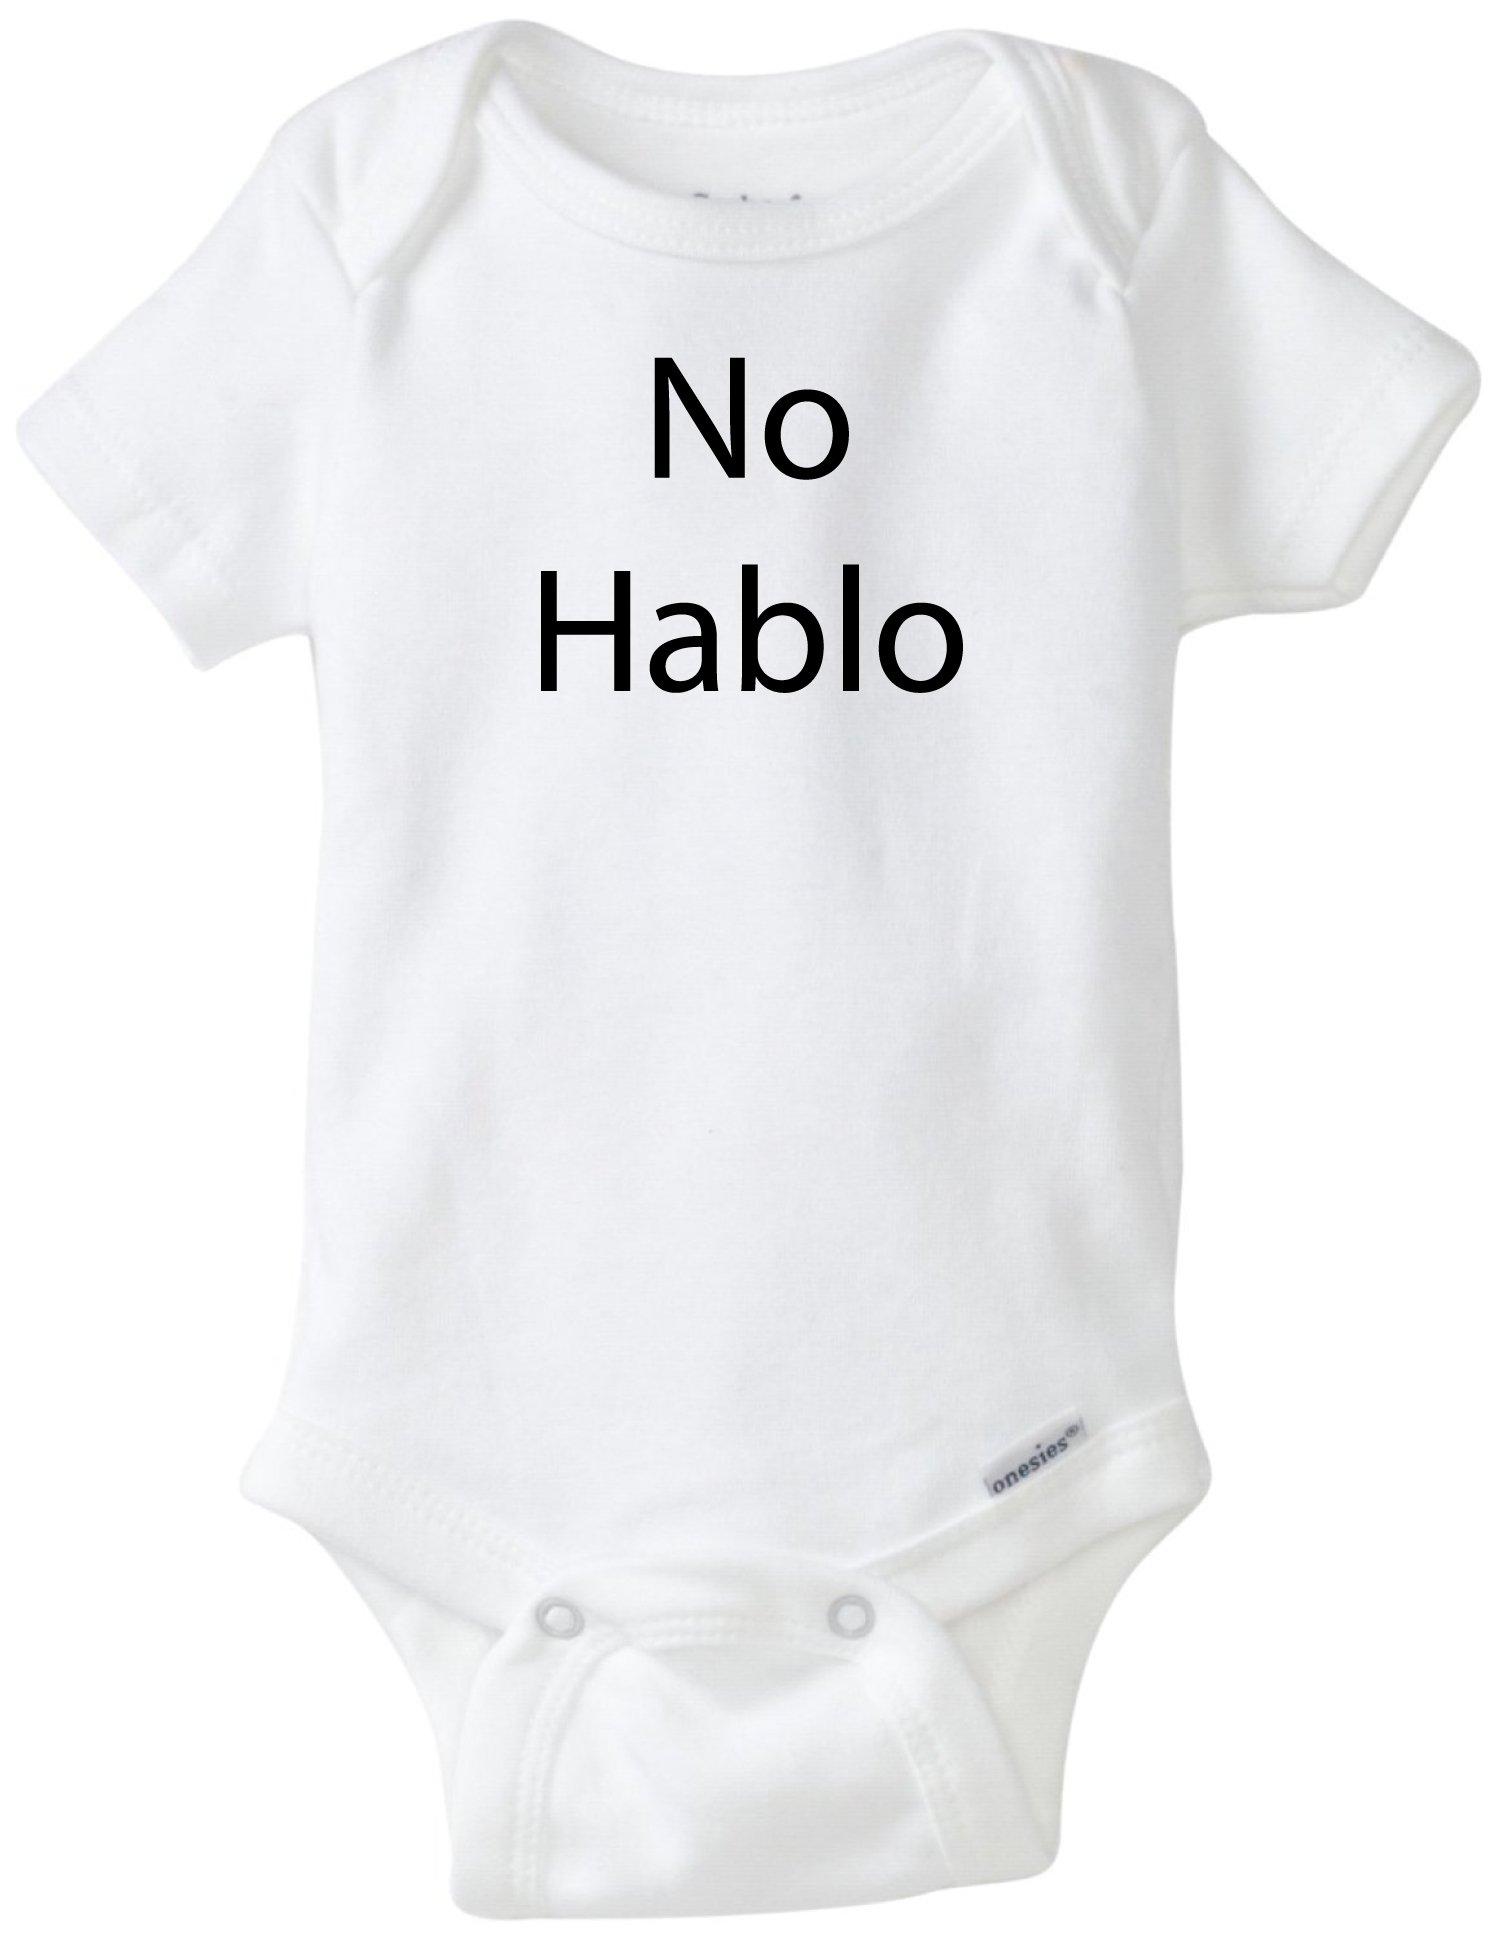 BLAKENREAG No Hablo Funny Baby Onesie Baby Boy Girl Clothes Bodysuit (6 Month)